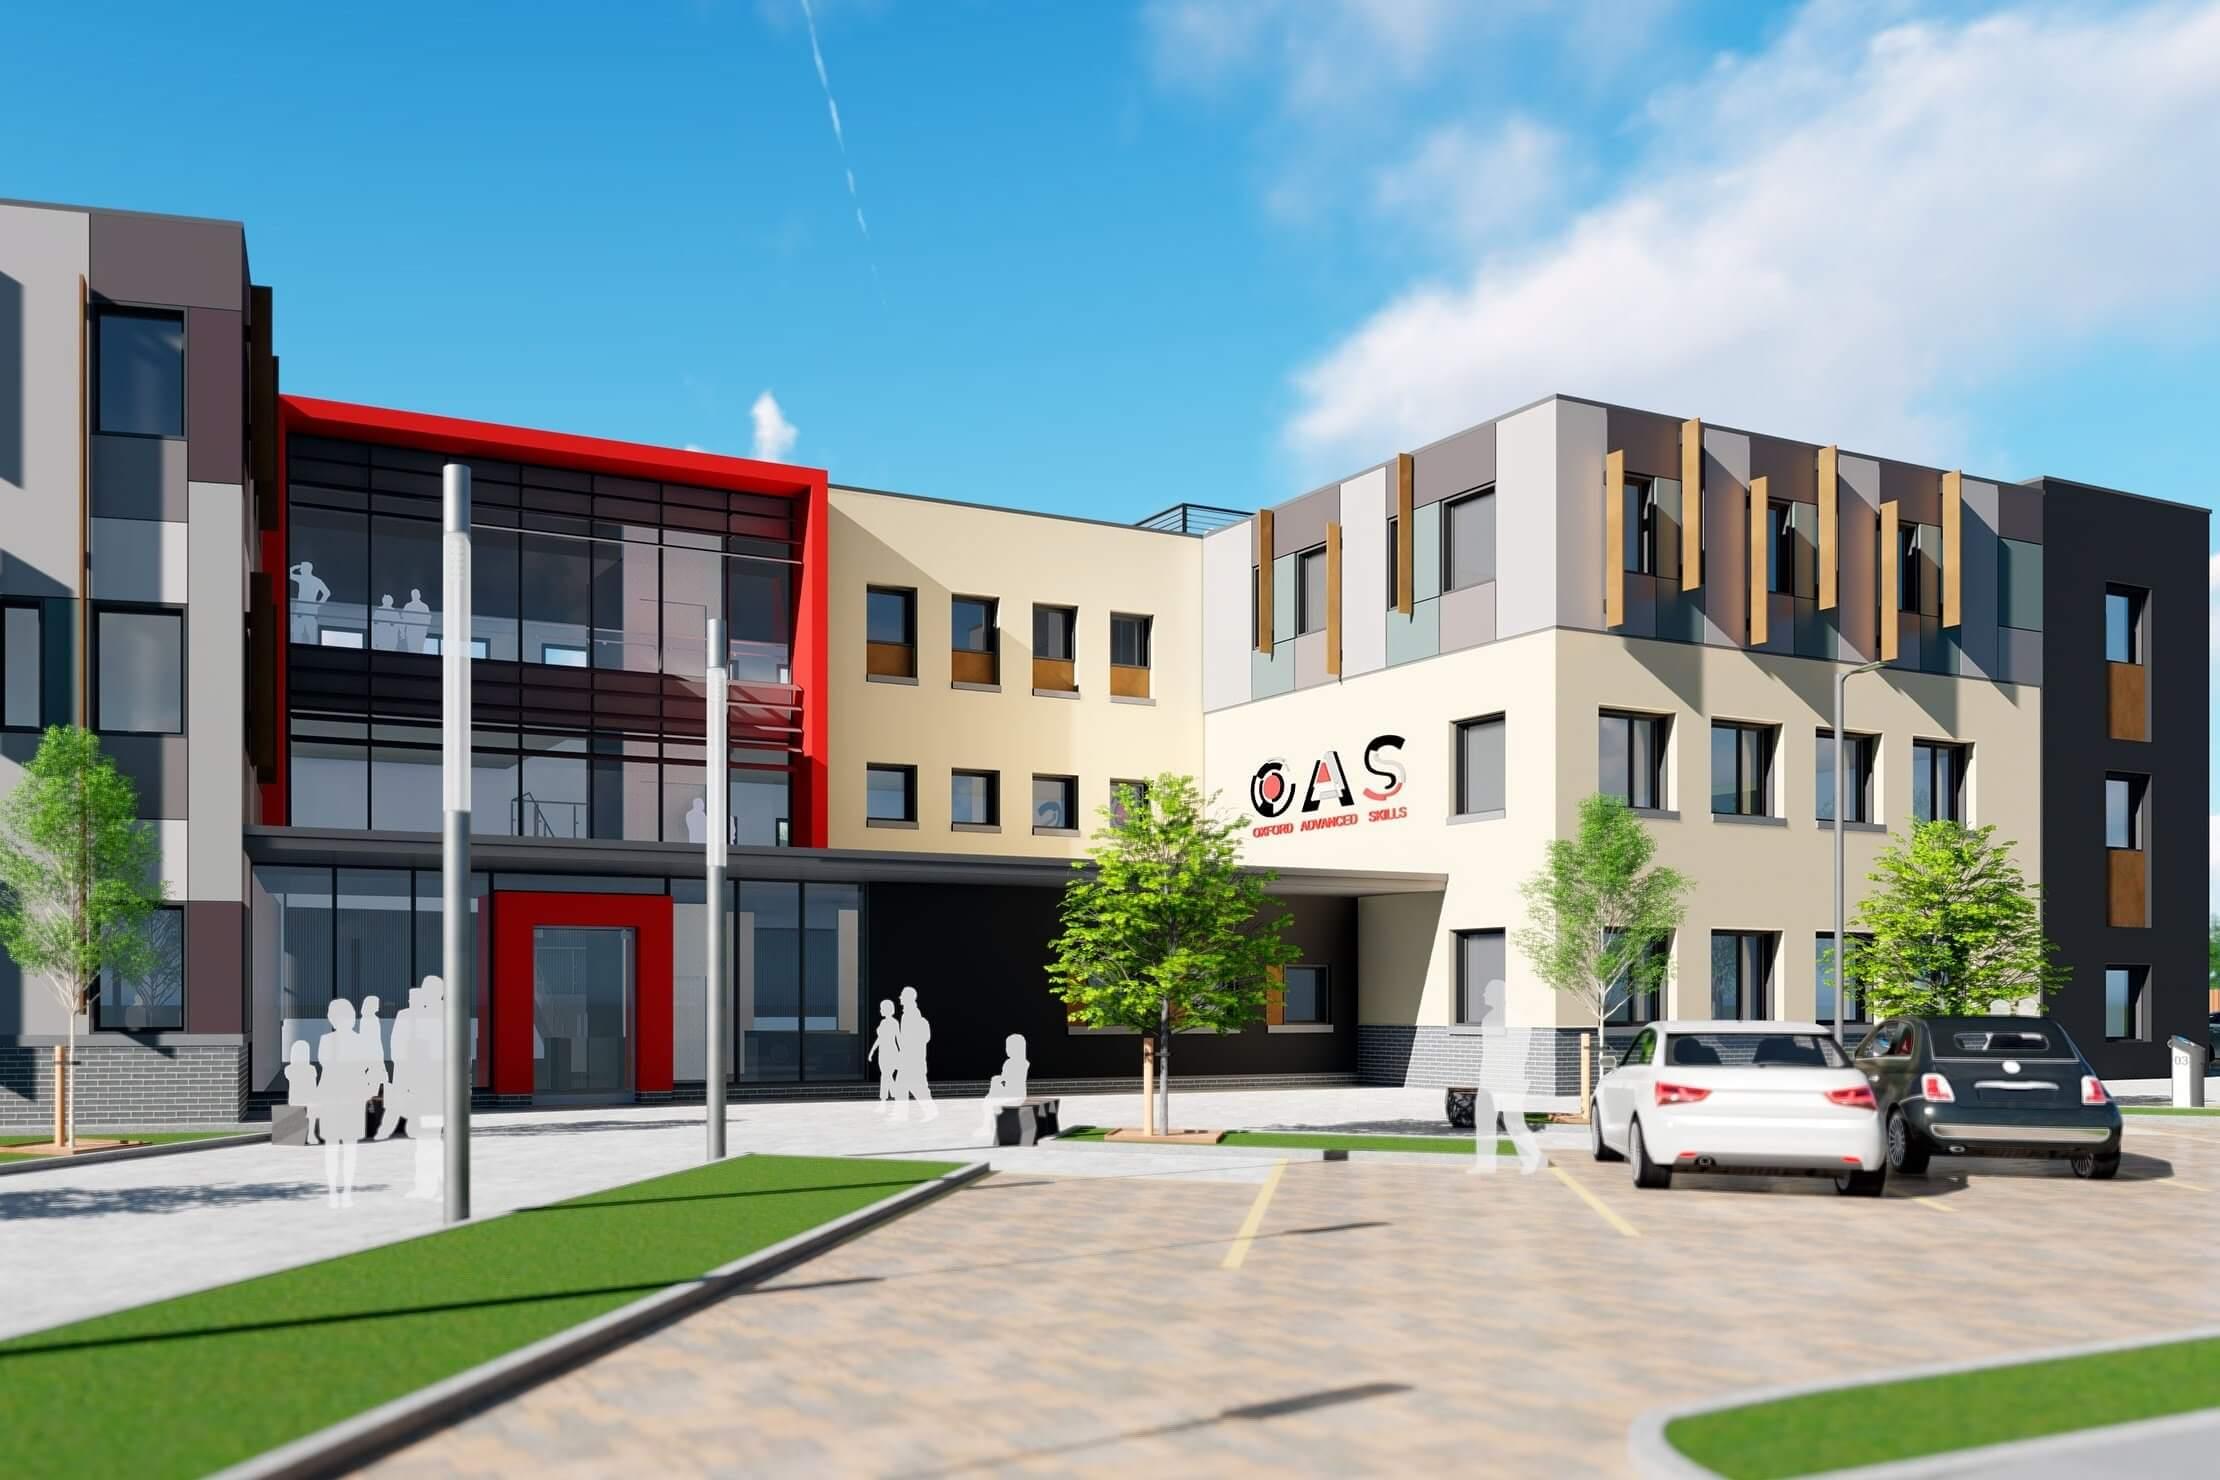 OAS Building-591500-edited